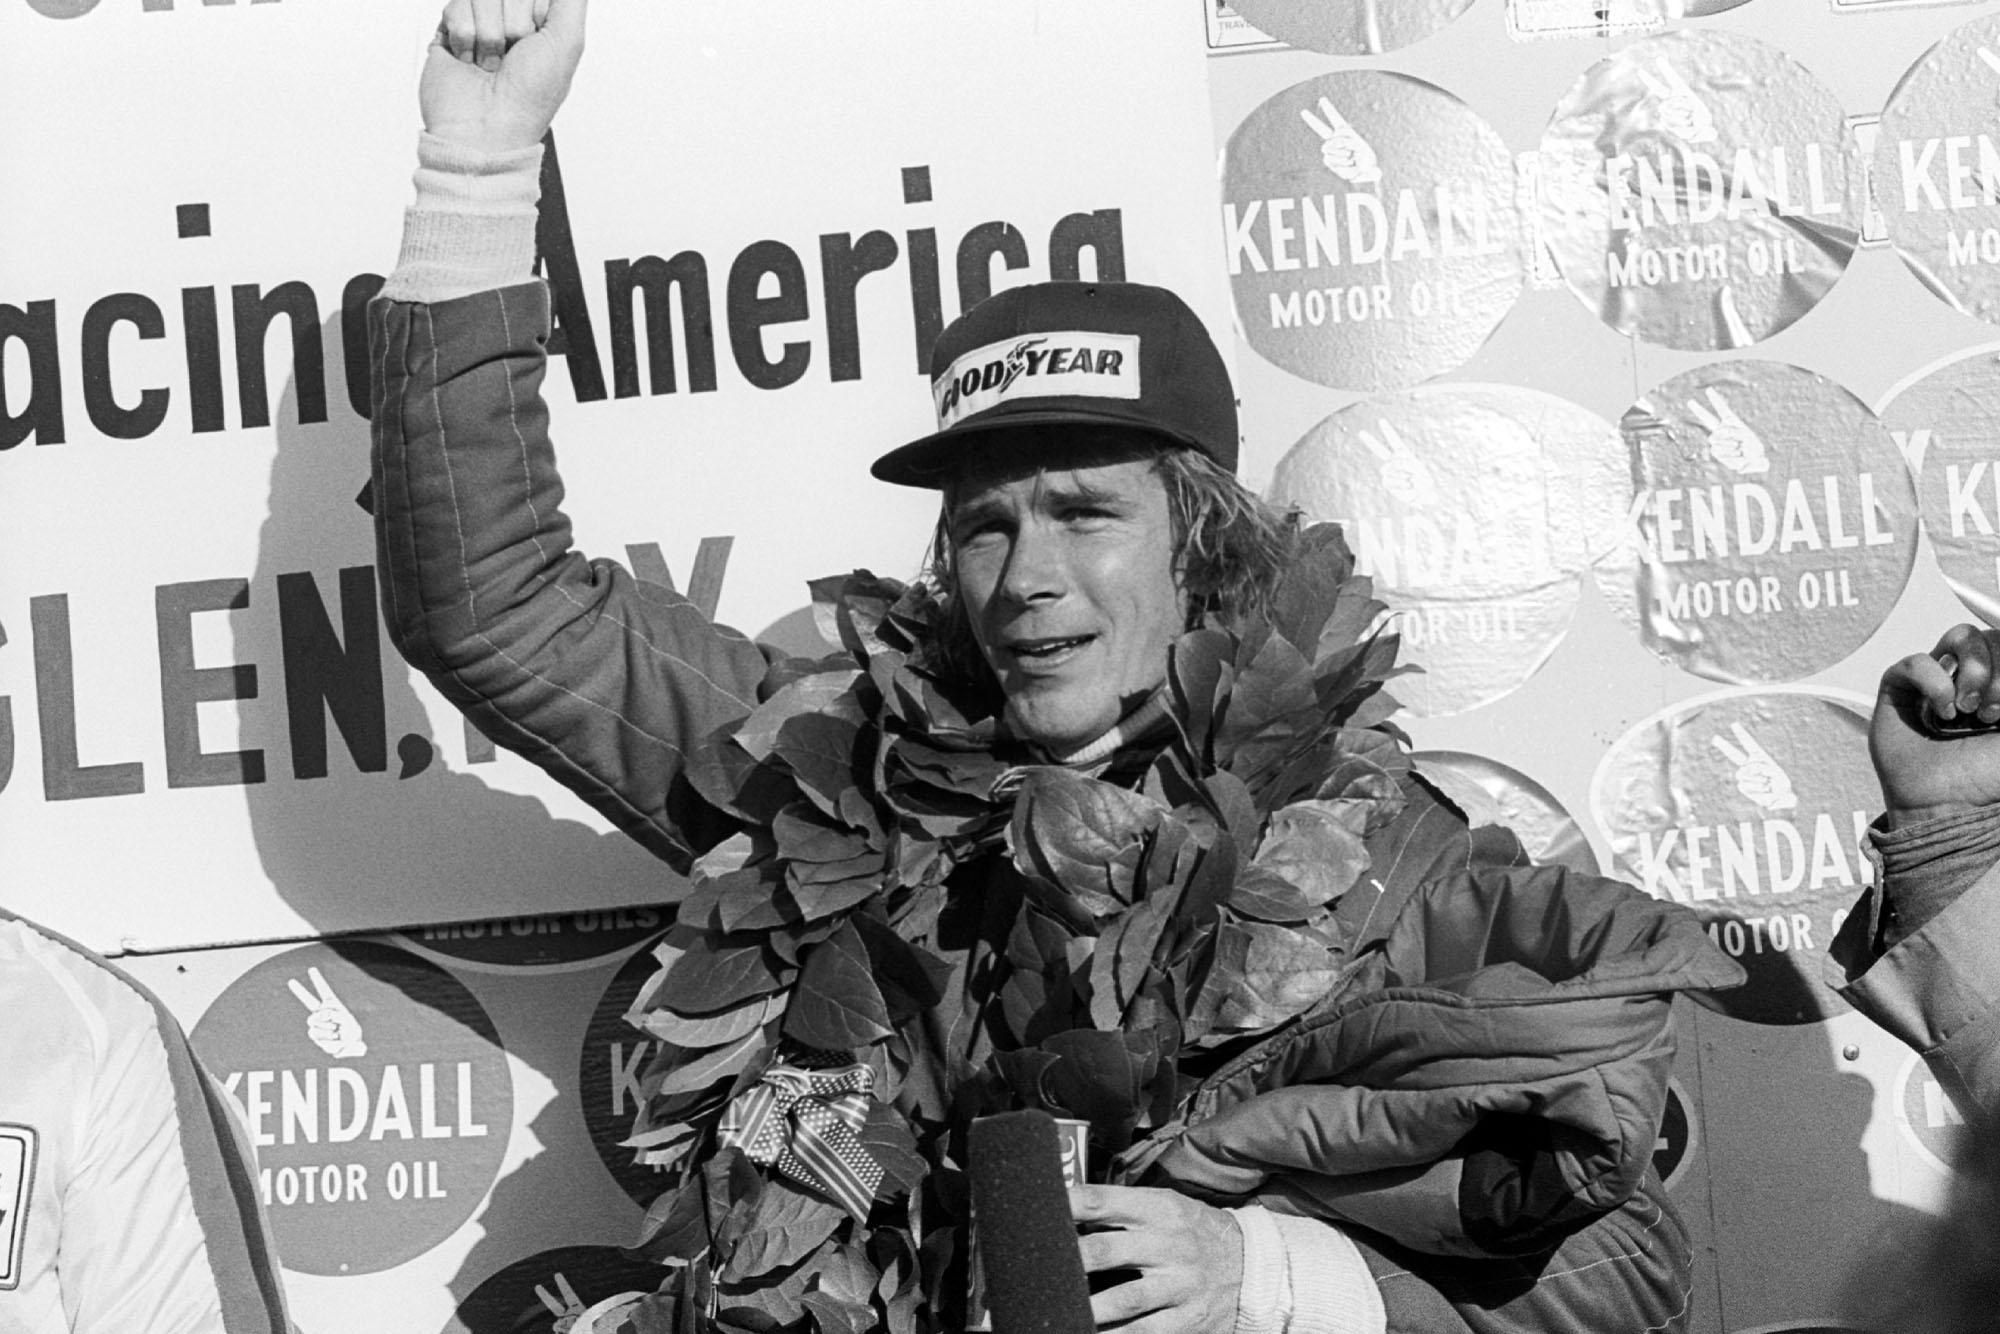 James Hunt (McLaren) celebrates his win on the podium at the 1976 United States Grand Prix East, Watkins Glen.